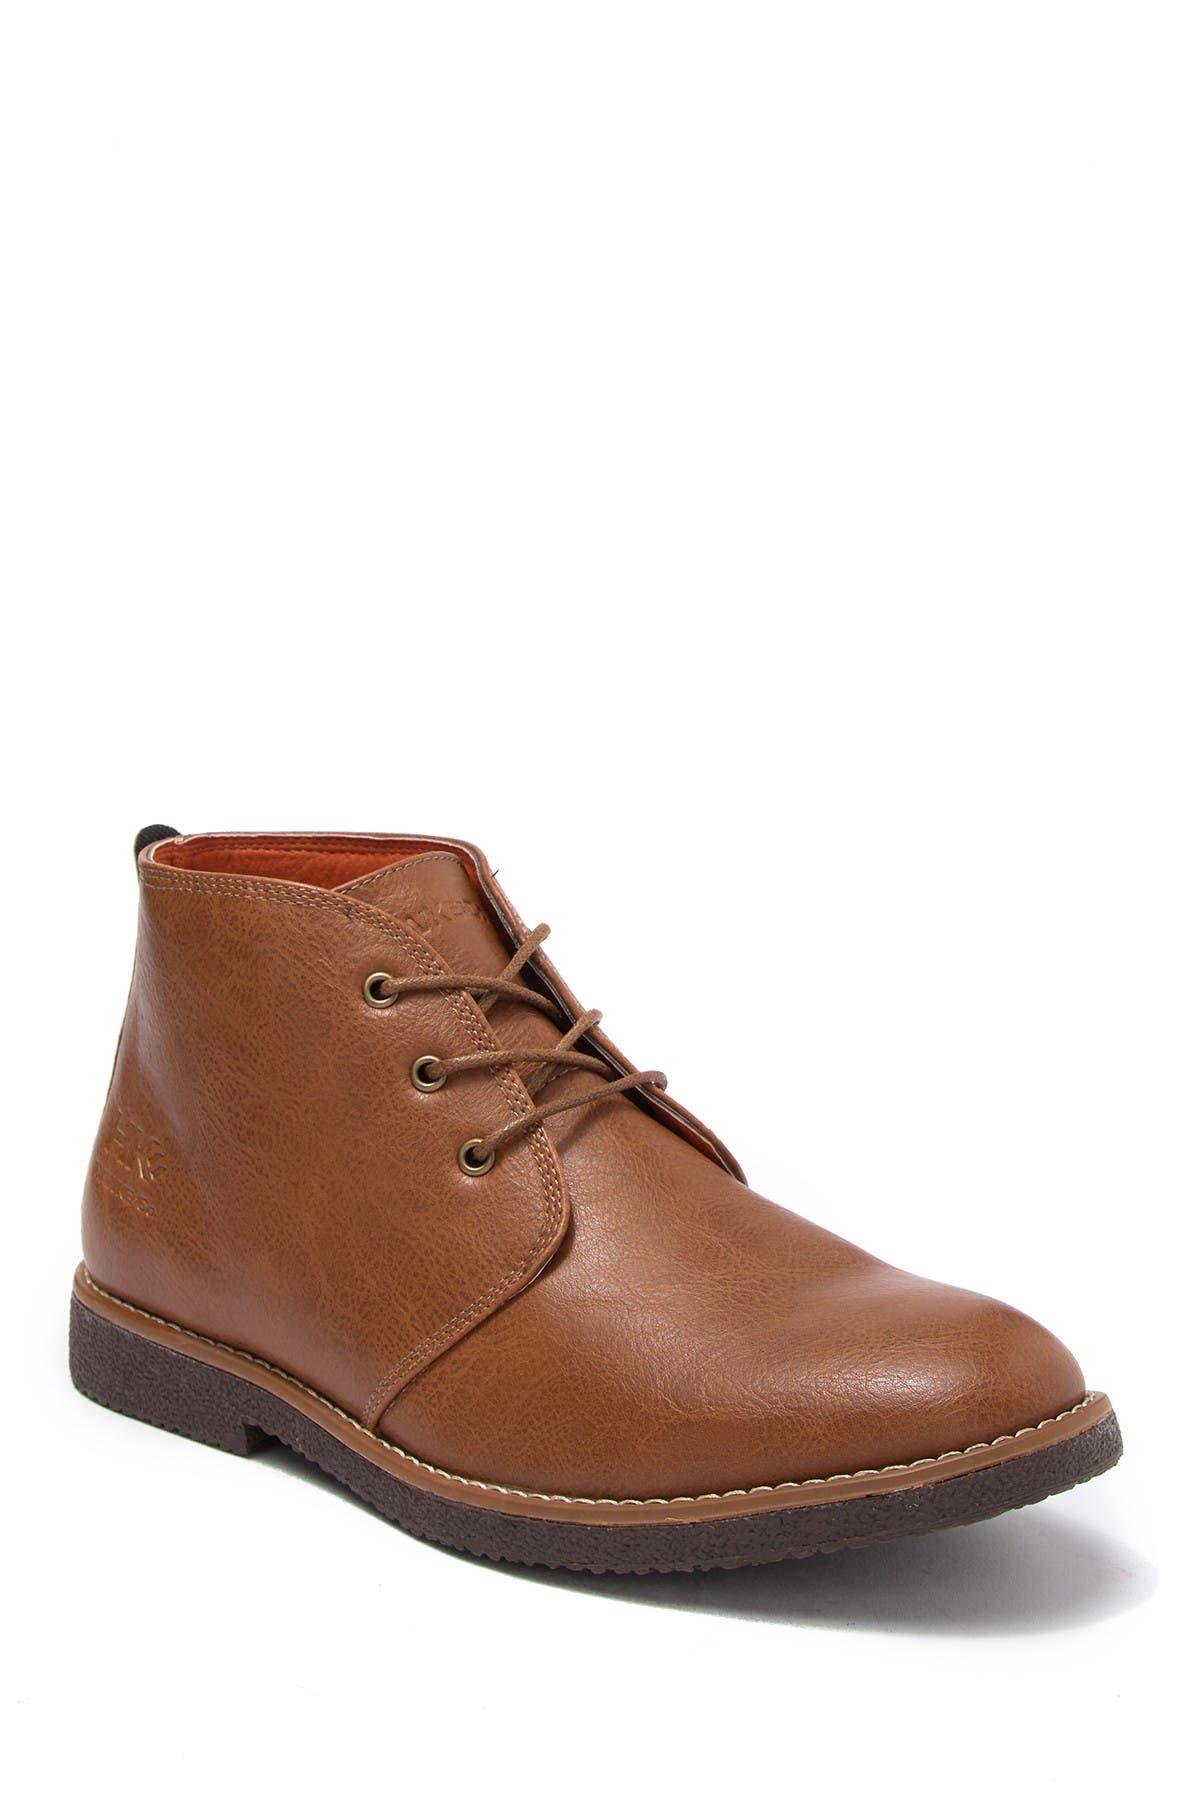 mens dress boots near me